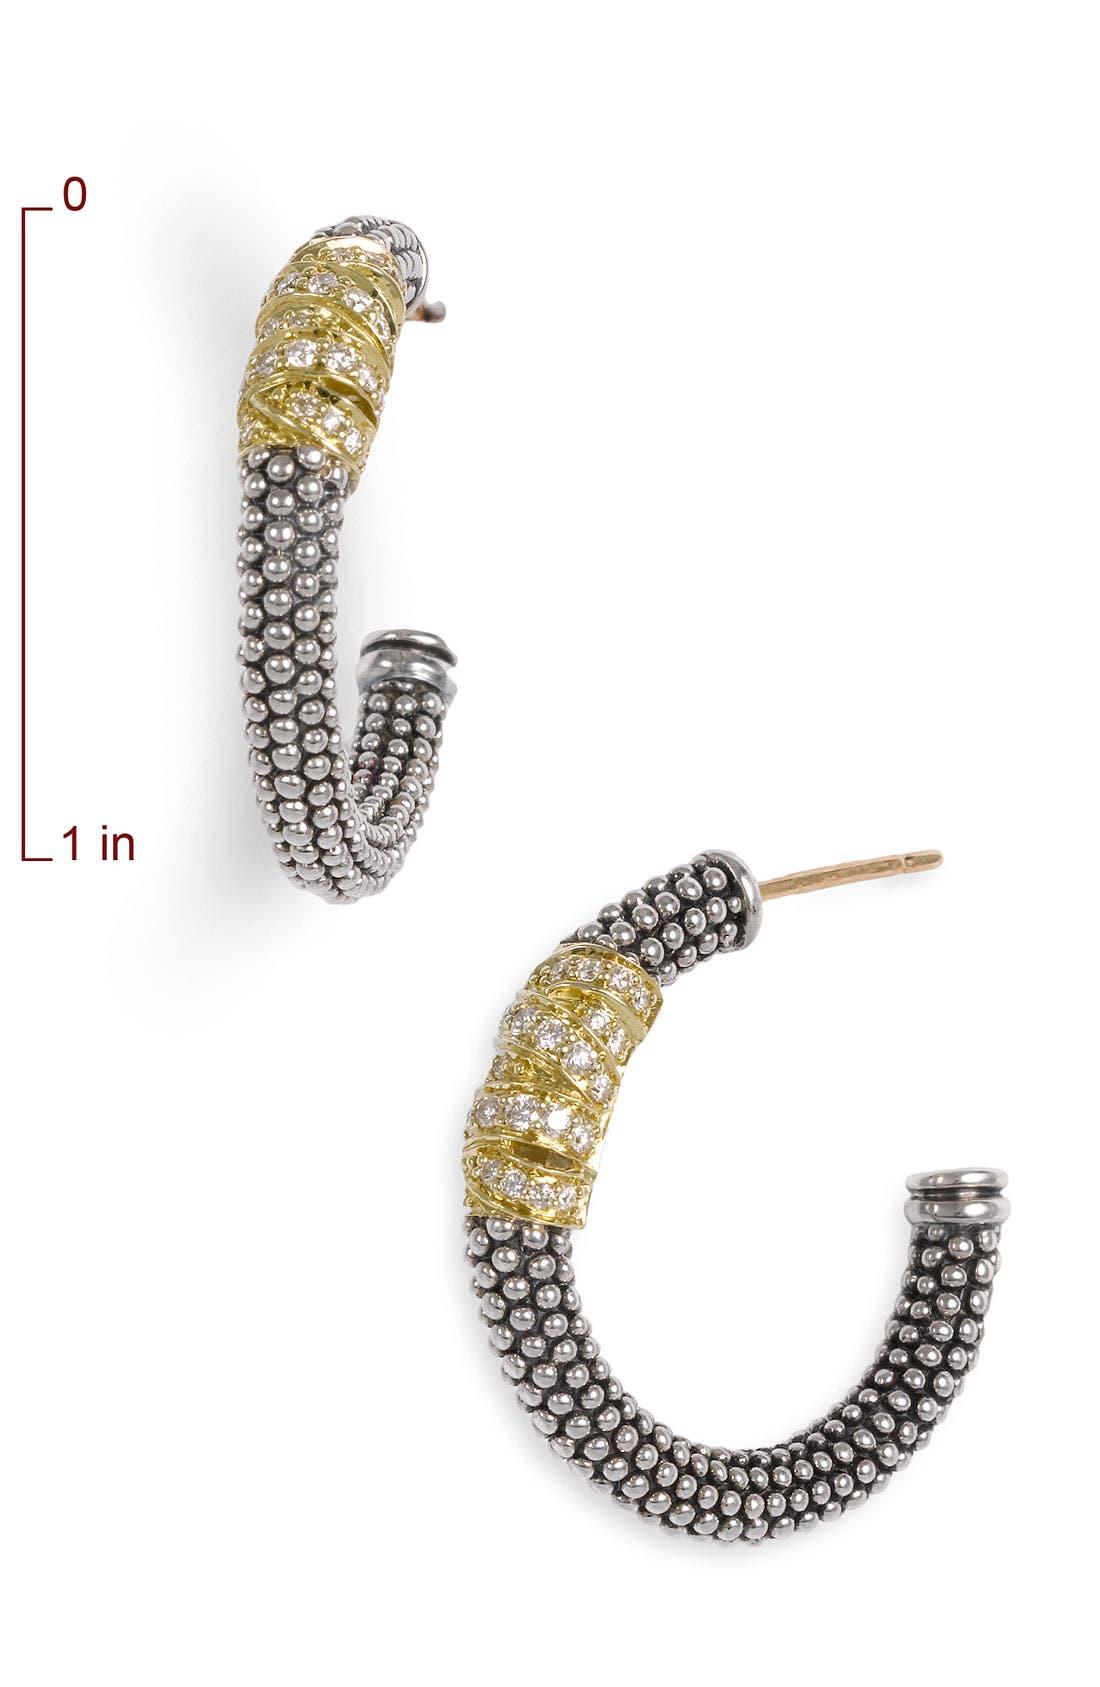 'Embrace' Caviar Diamond Hoop Earrings,                             Alternate thumbnail 3, color,                             STERLING SILVER/ GOLD